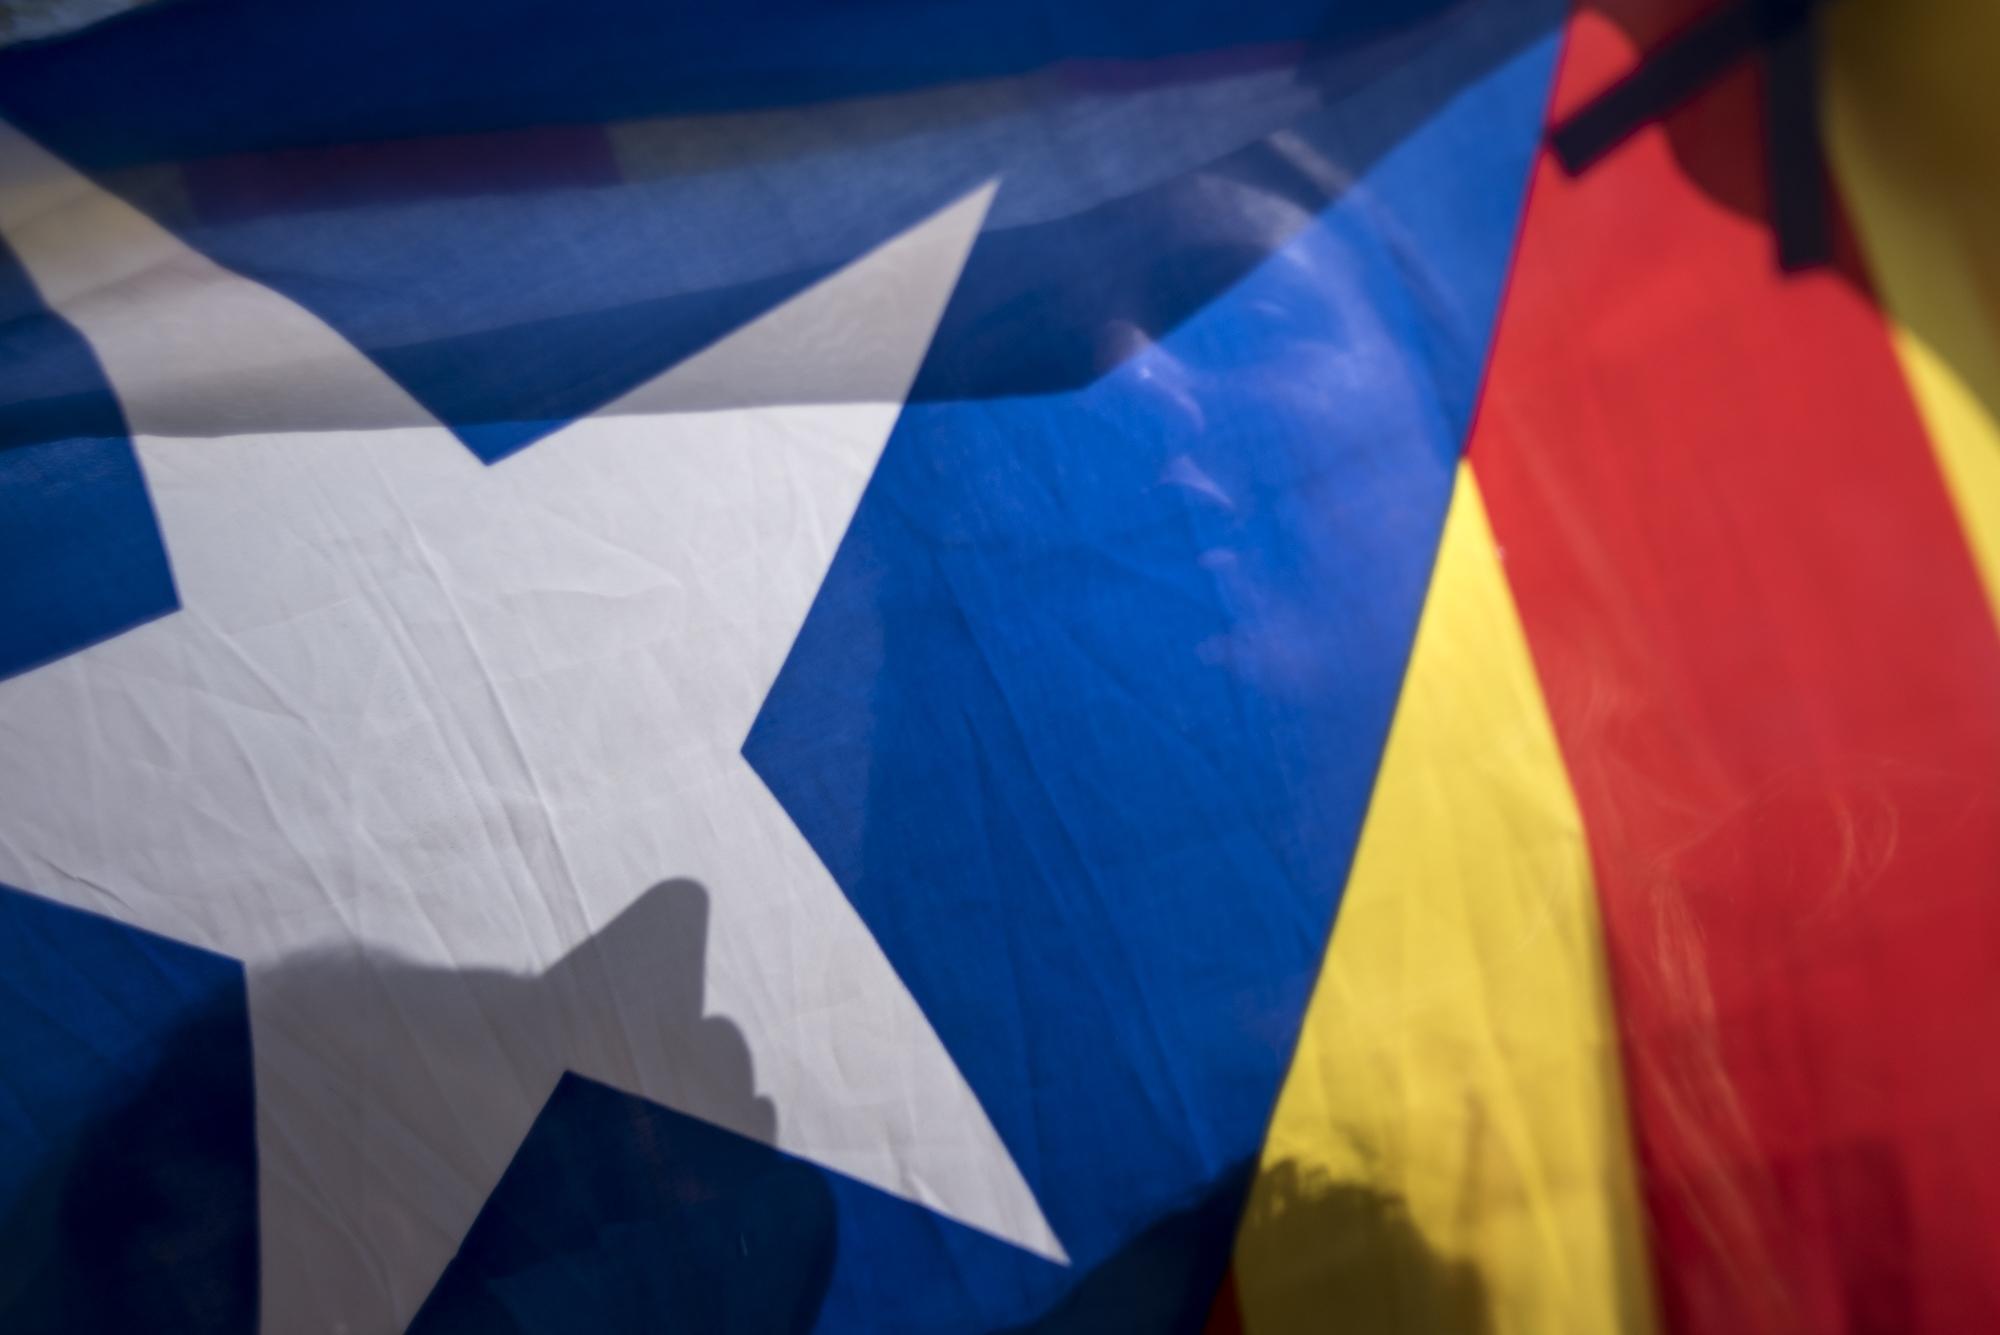 Art and Documentary Photography - Loading CatalanIndependence001.JPG